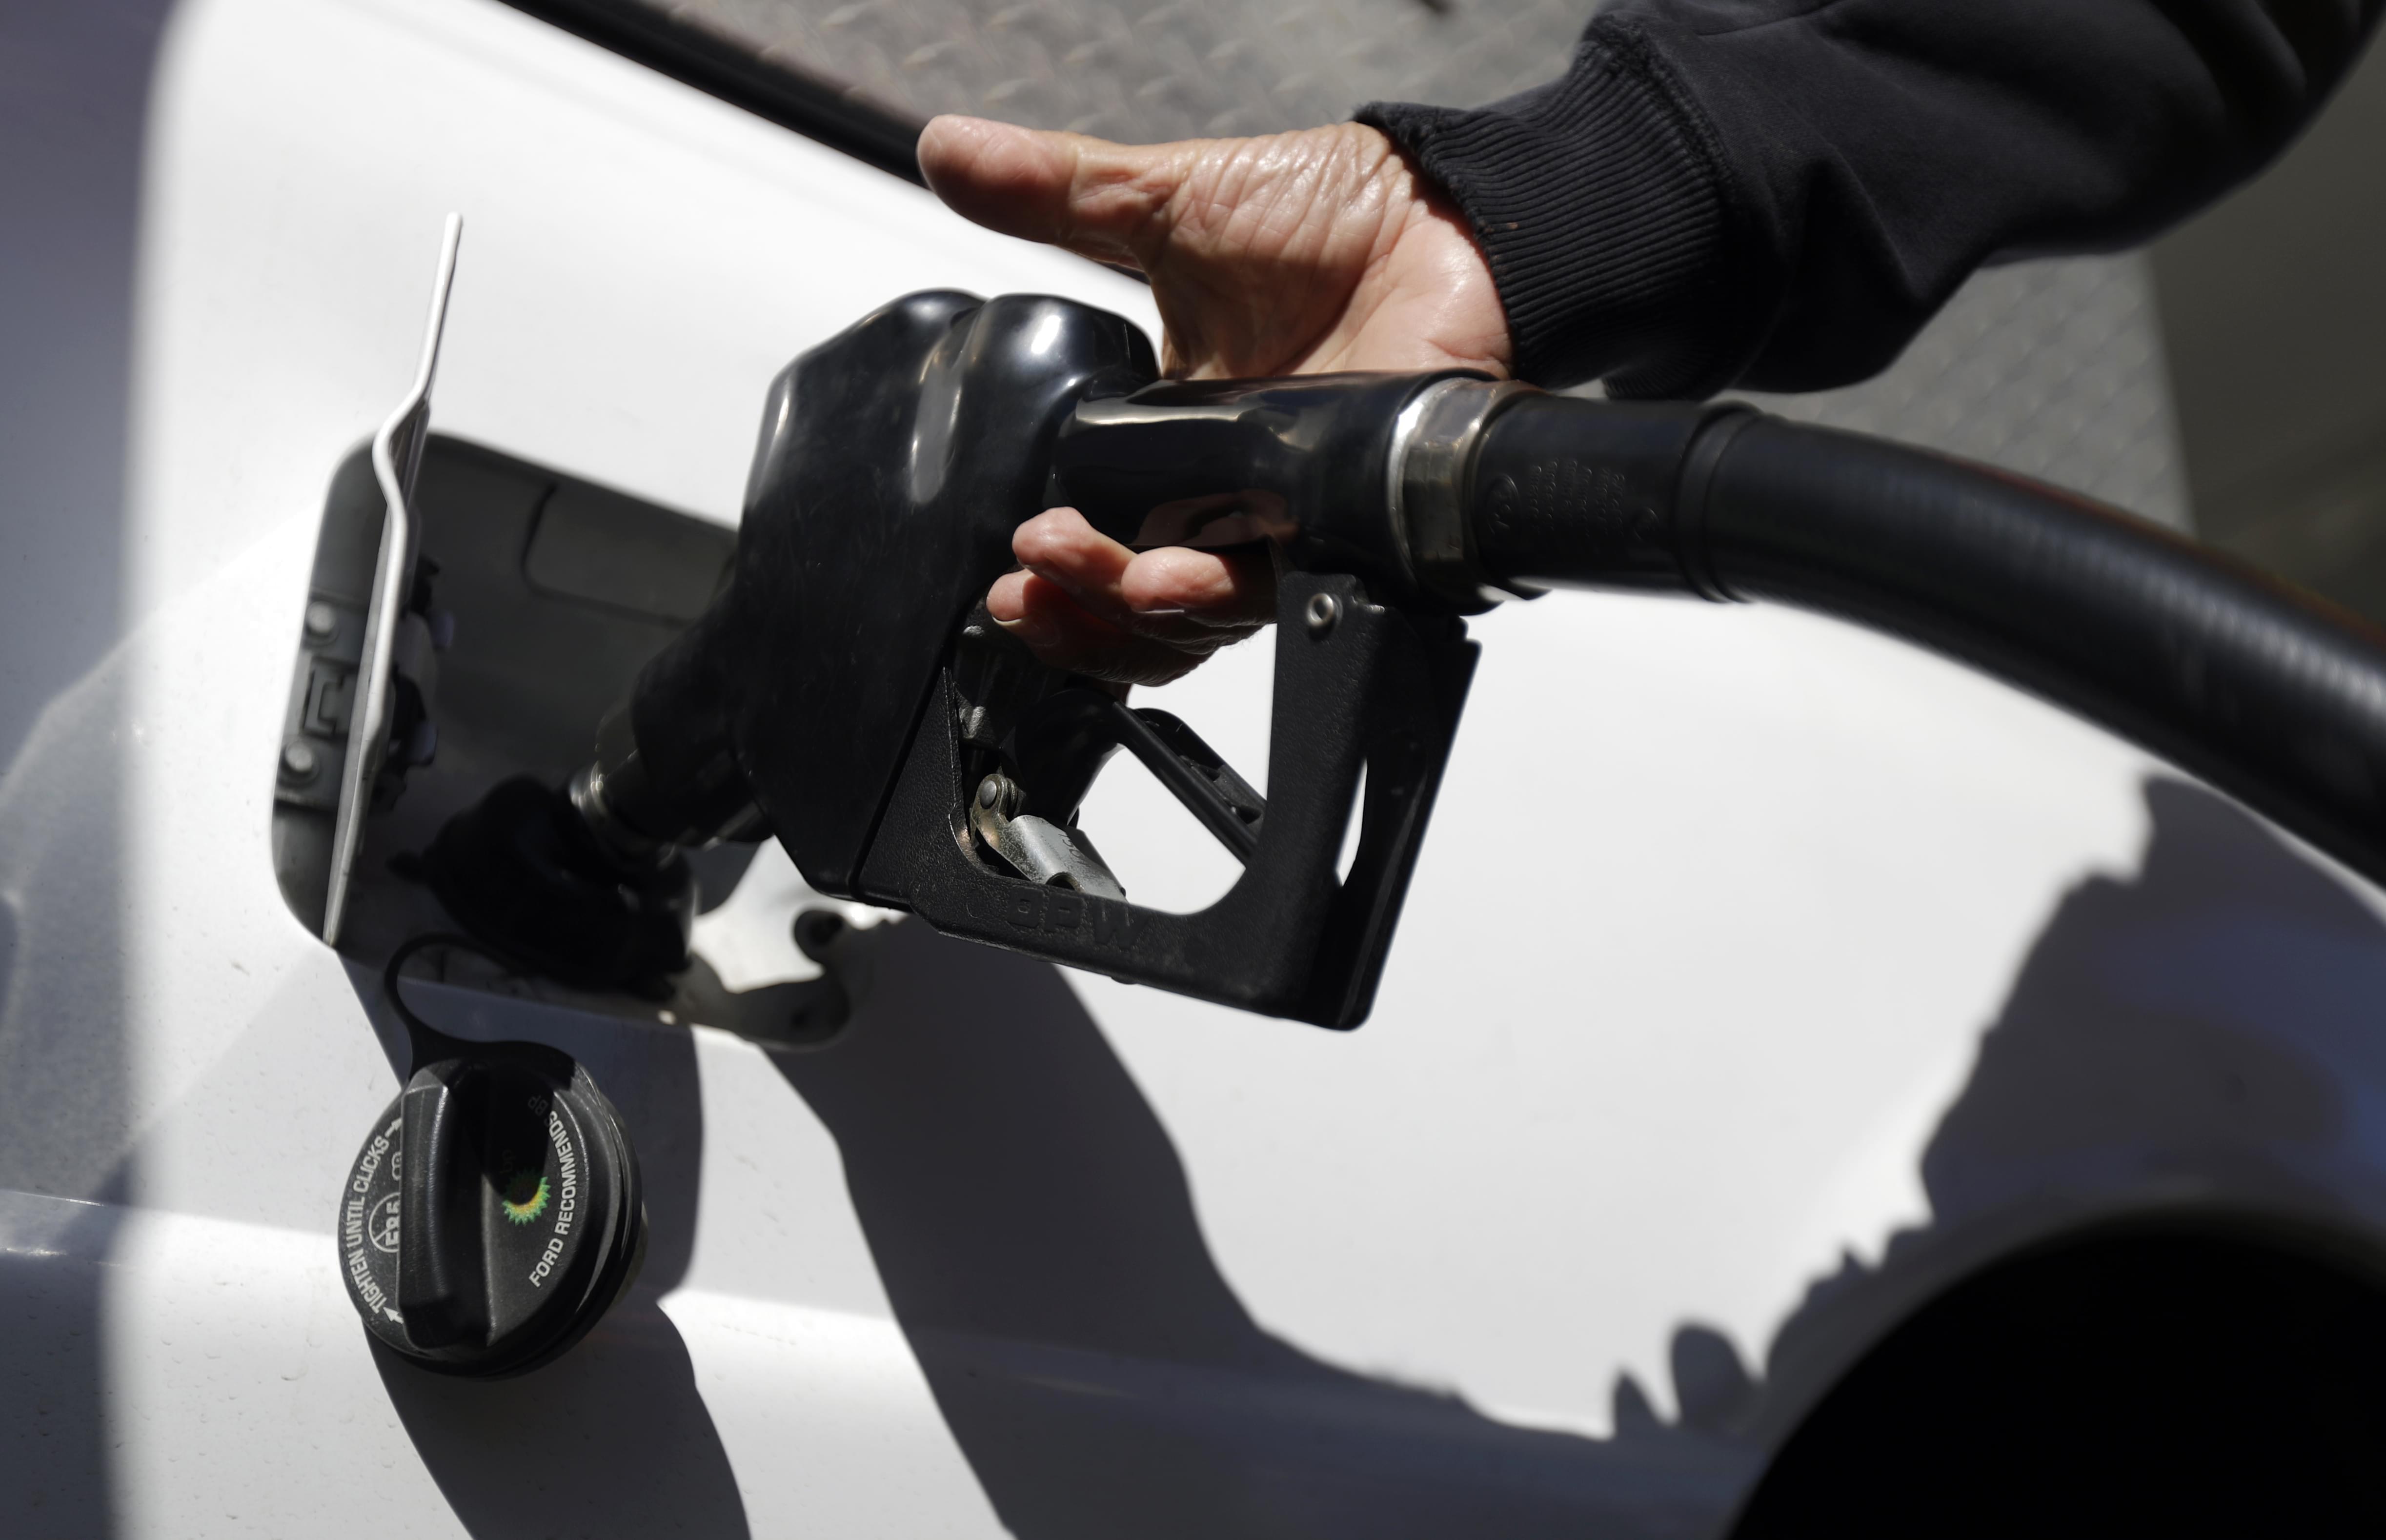 A person pumps gas into their car.